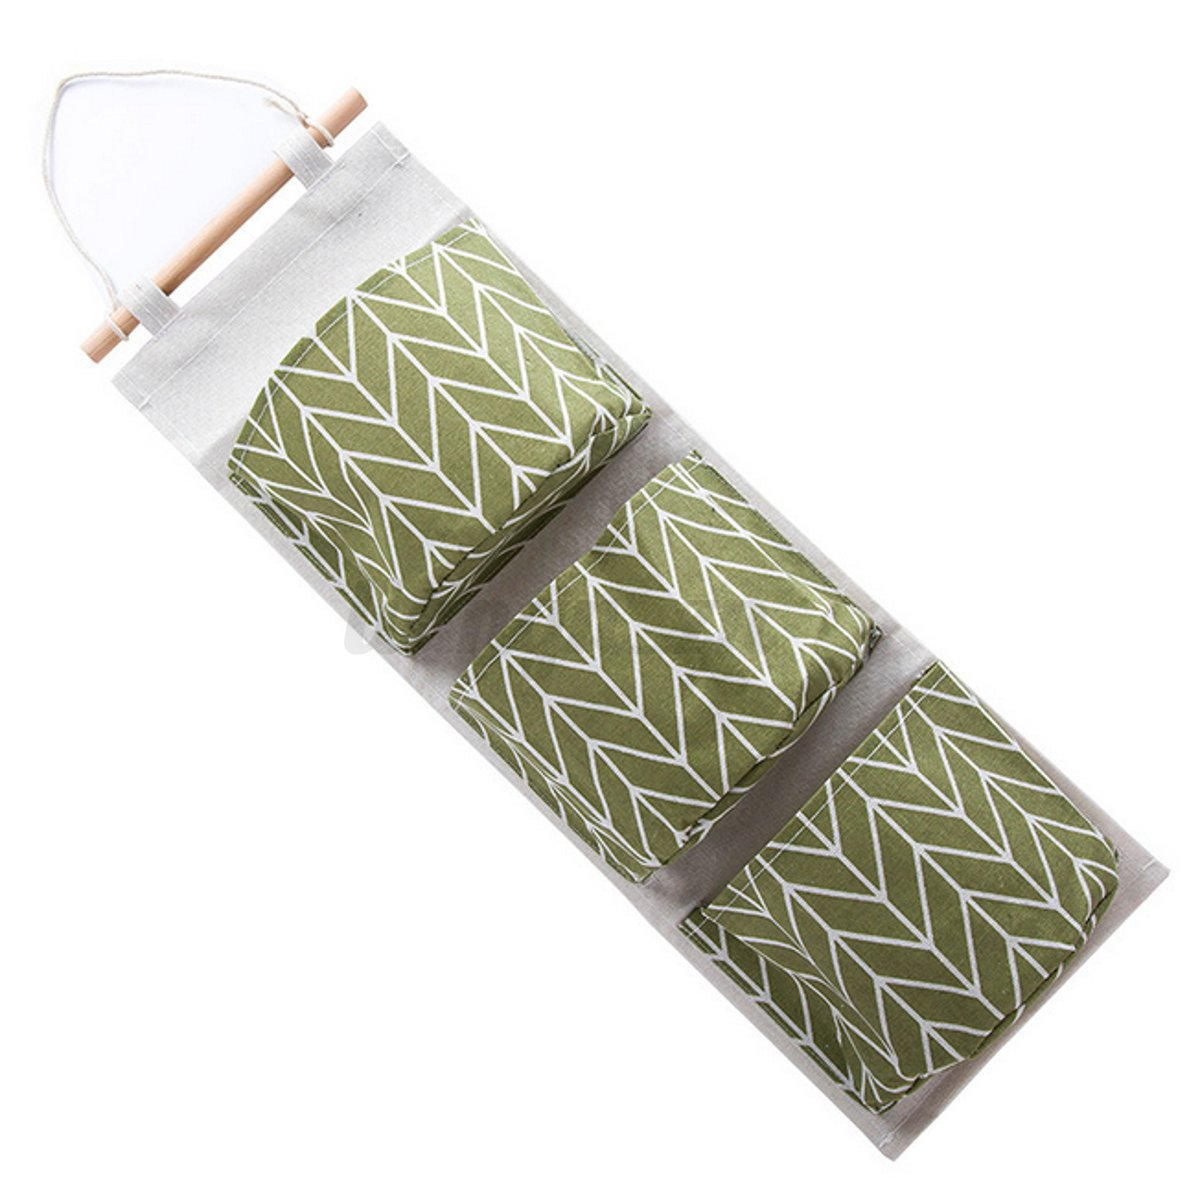 3 poches trouss organisateur suspendu sac rangement mural stockage range pliable ebay. Black Bedroom Furniture Sets. Home Design Ideas